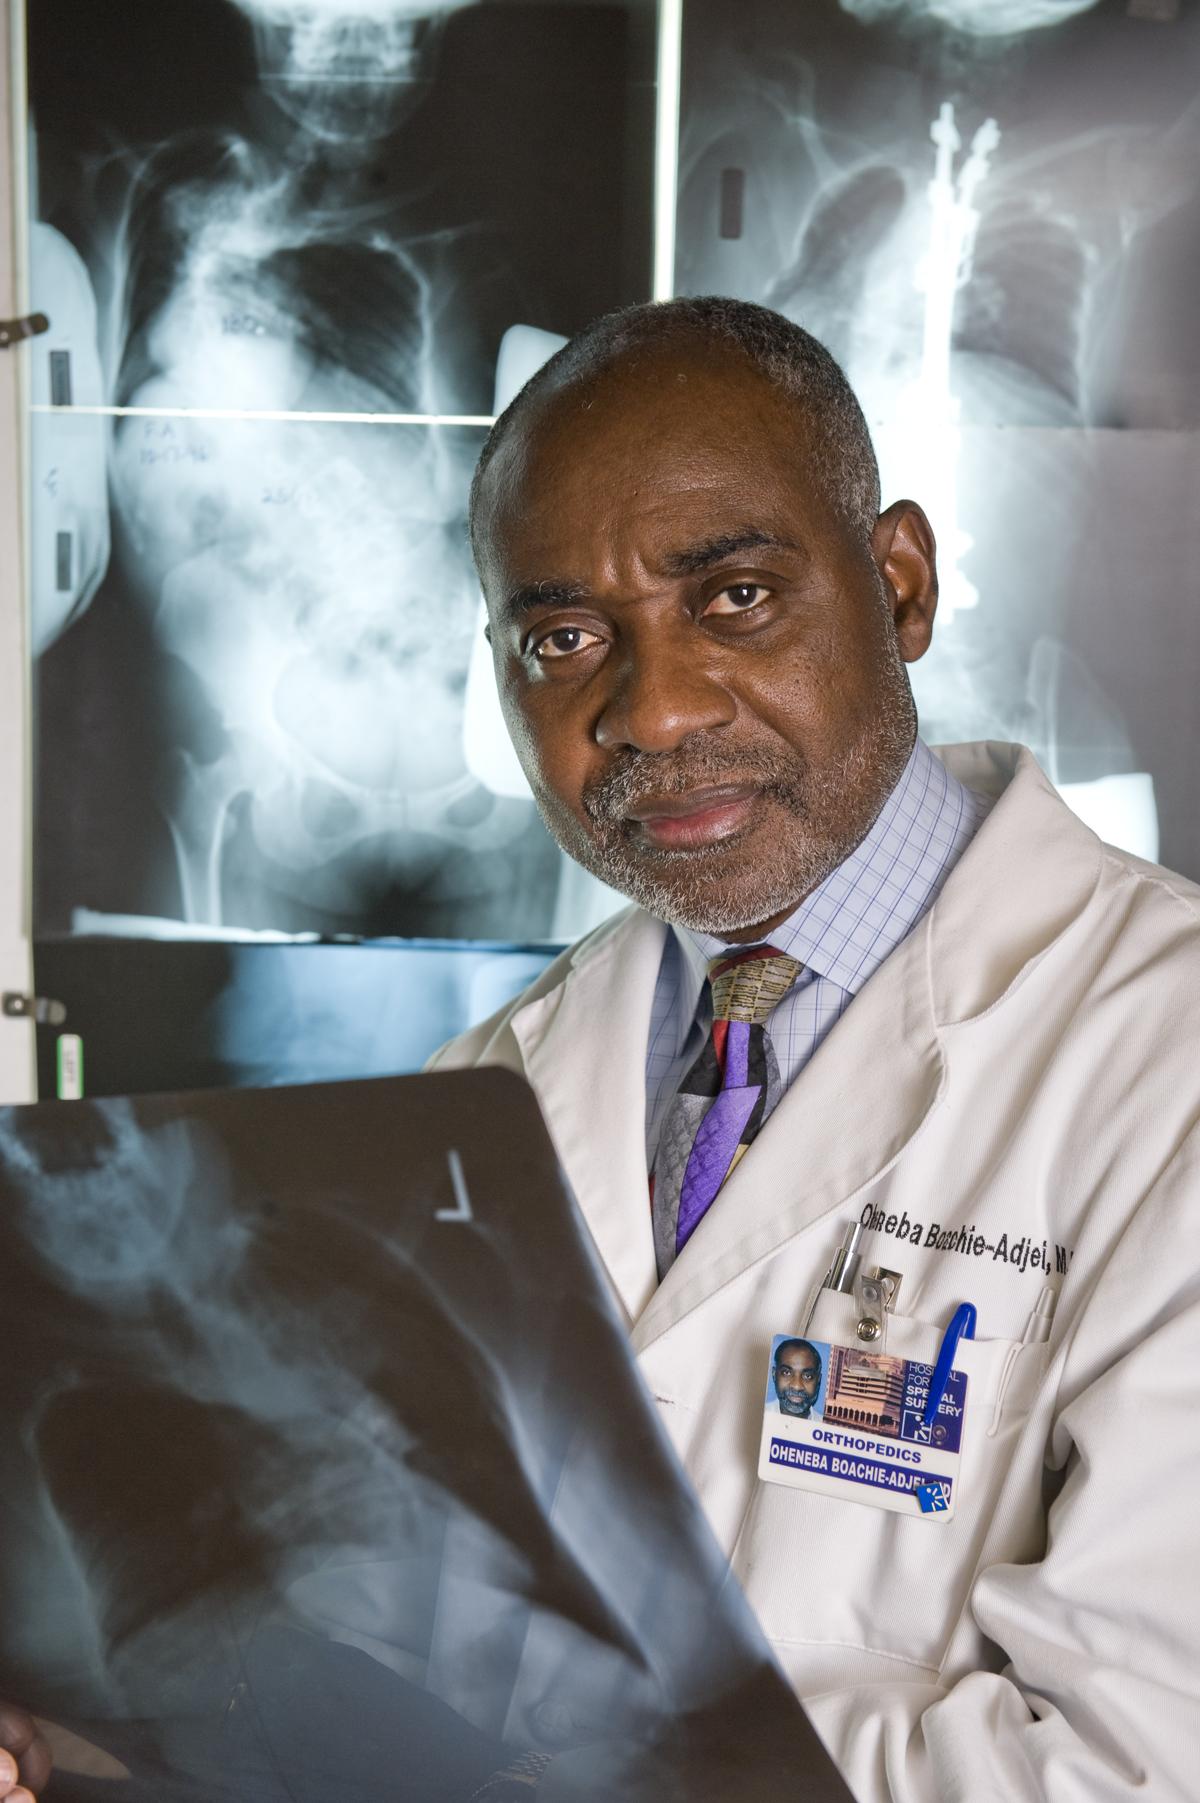 Dr. Oheneba-Boachie-Adjei